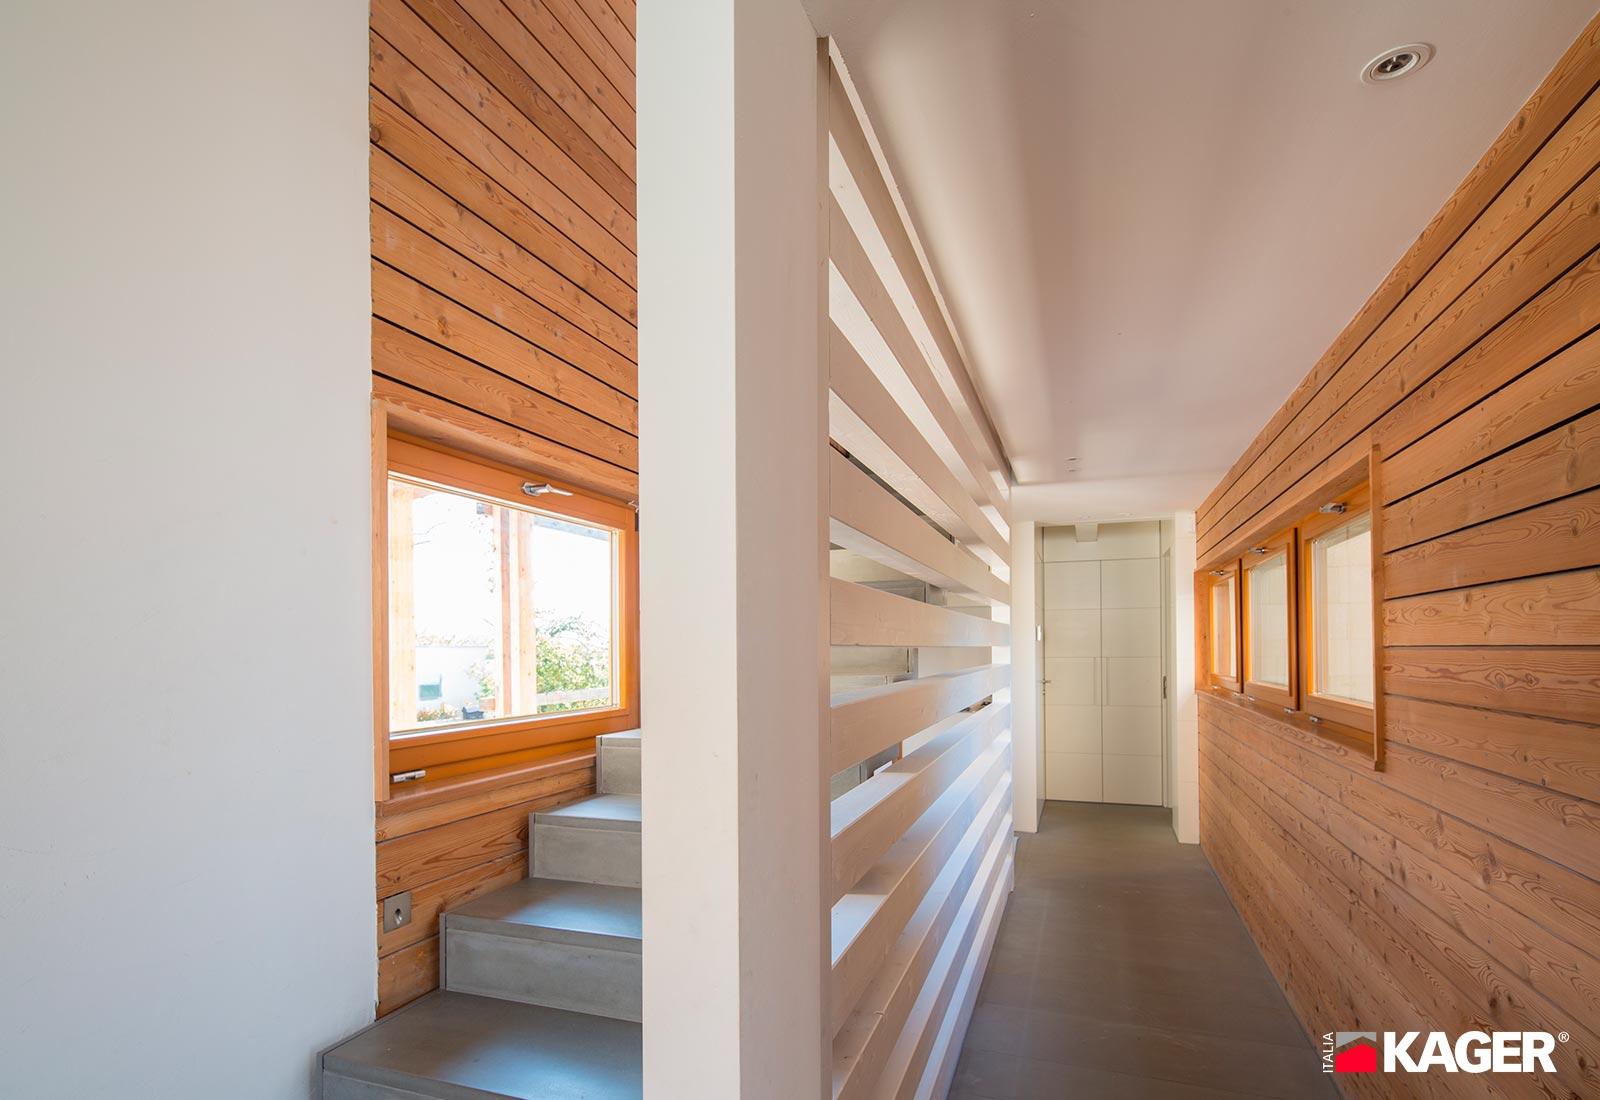 Casa-in-legno-Forli-Kager-Italia-09